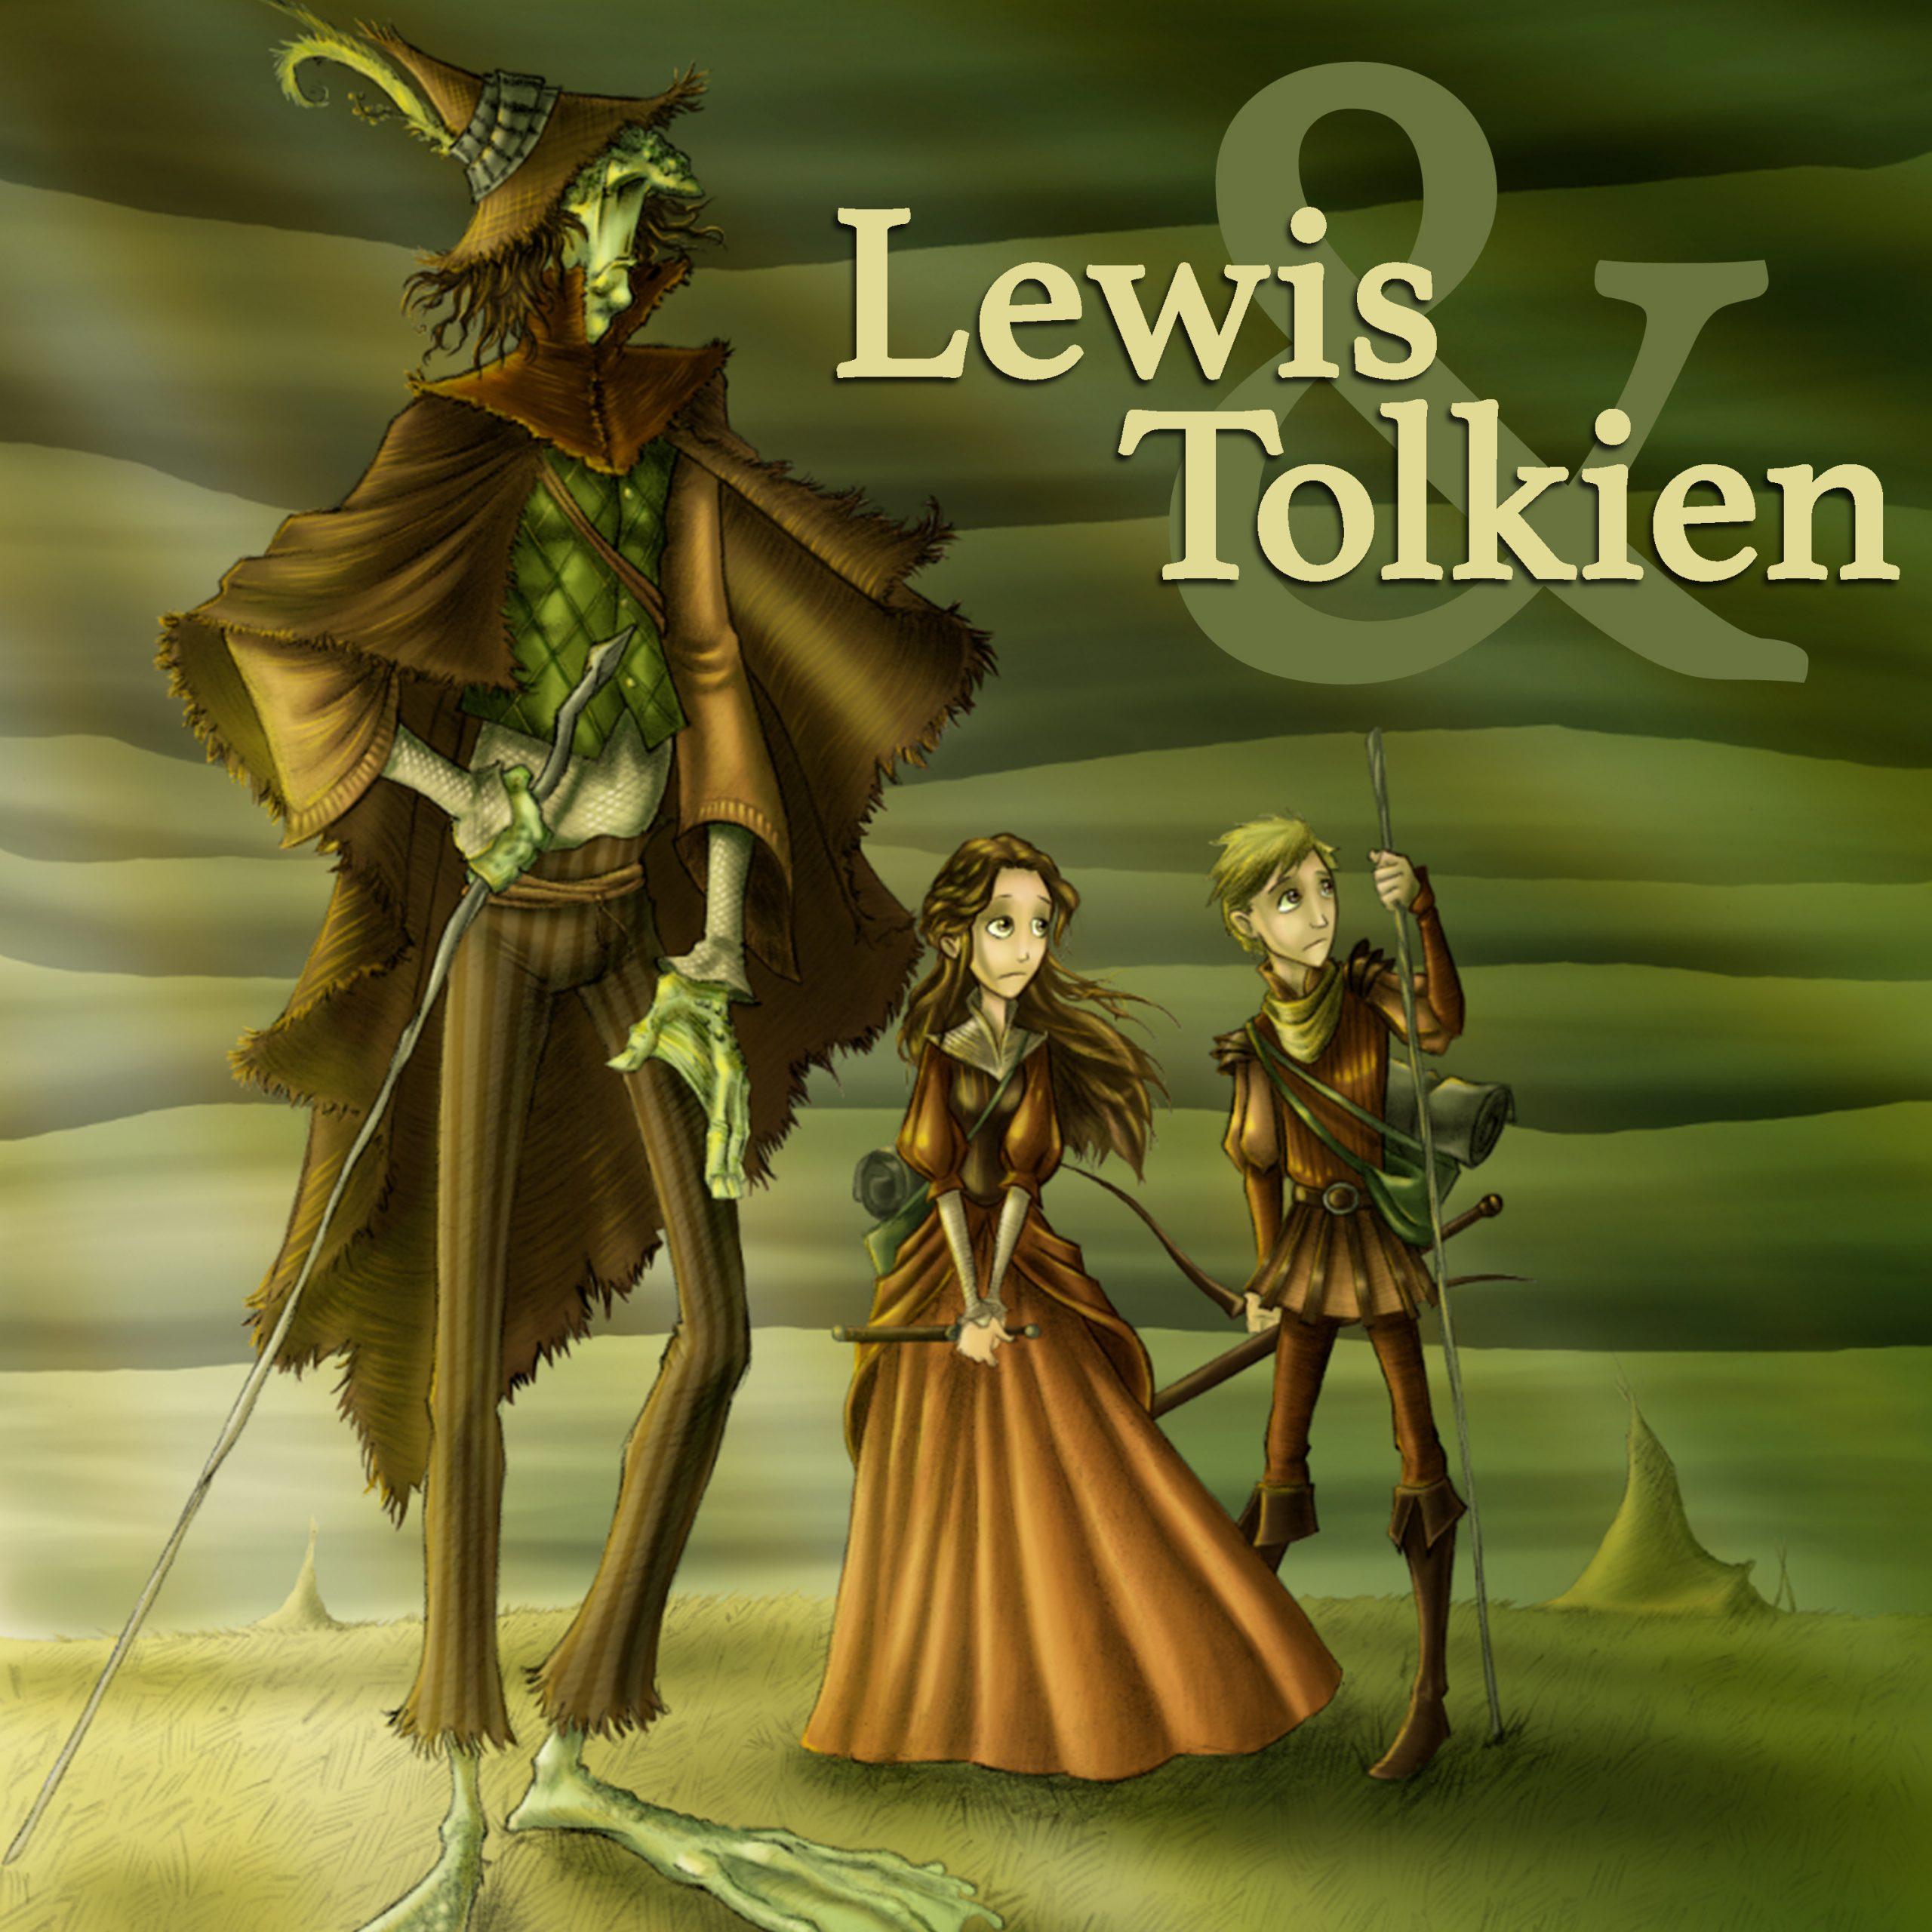 Lewis & Tolkien